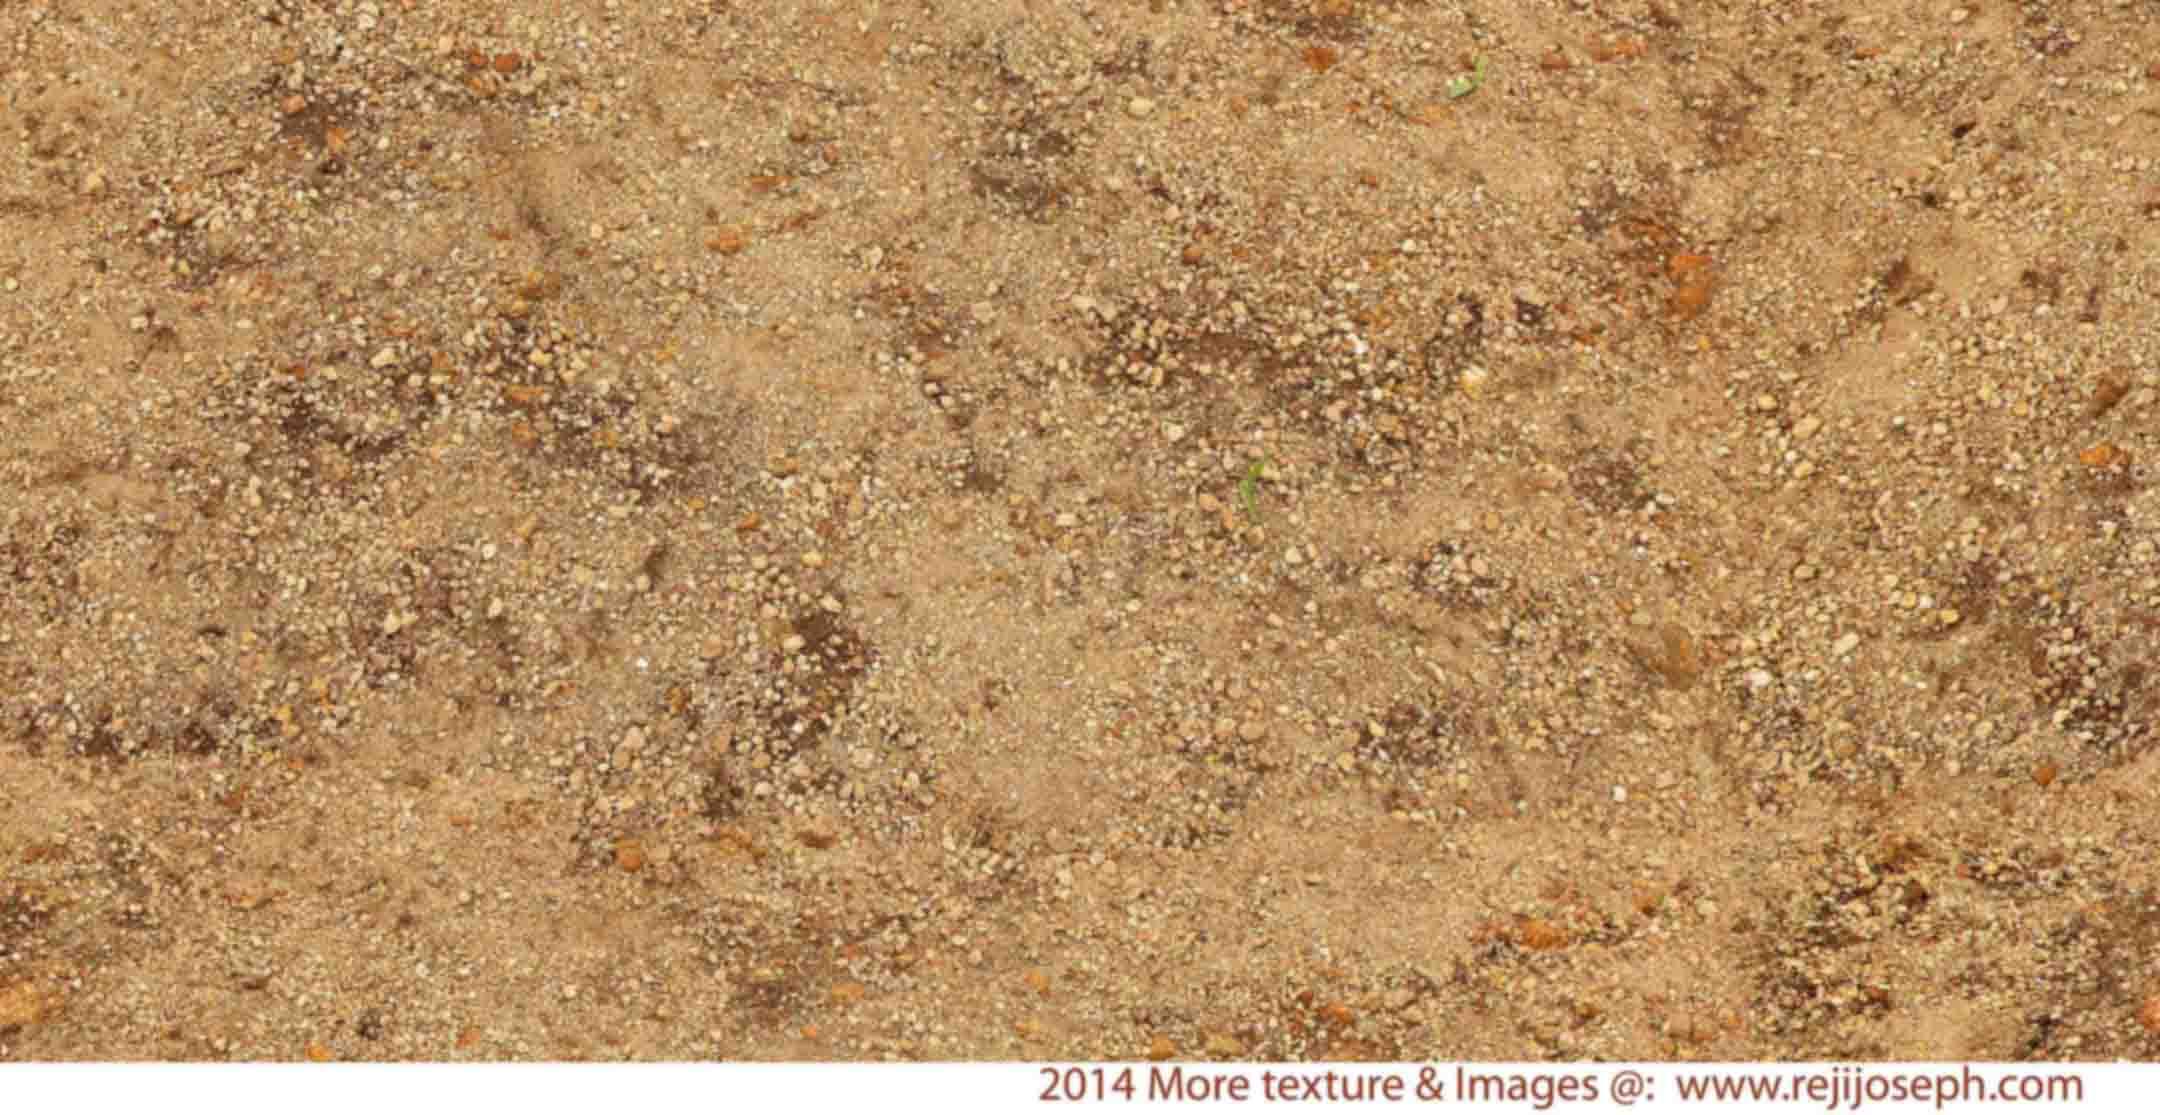 Sand texture 00001